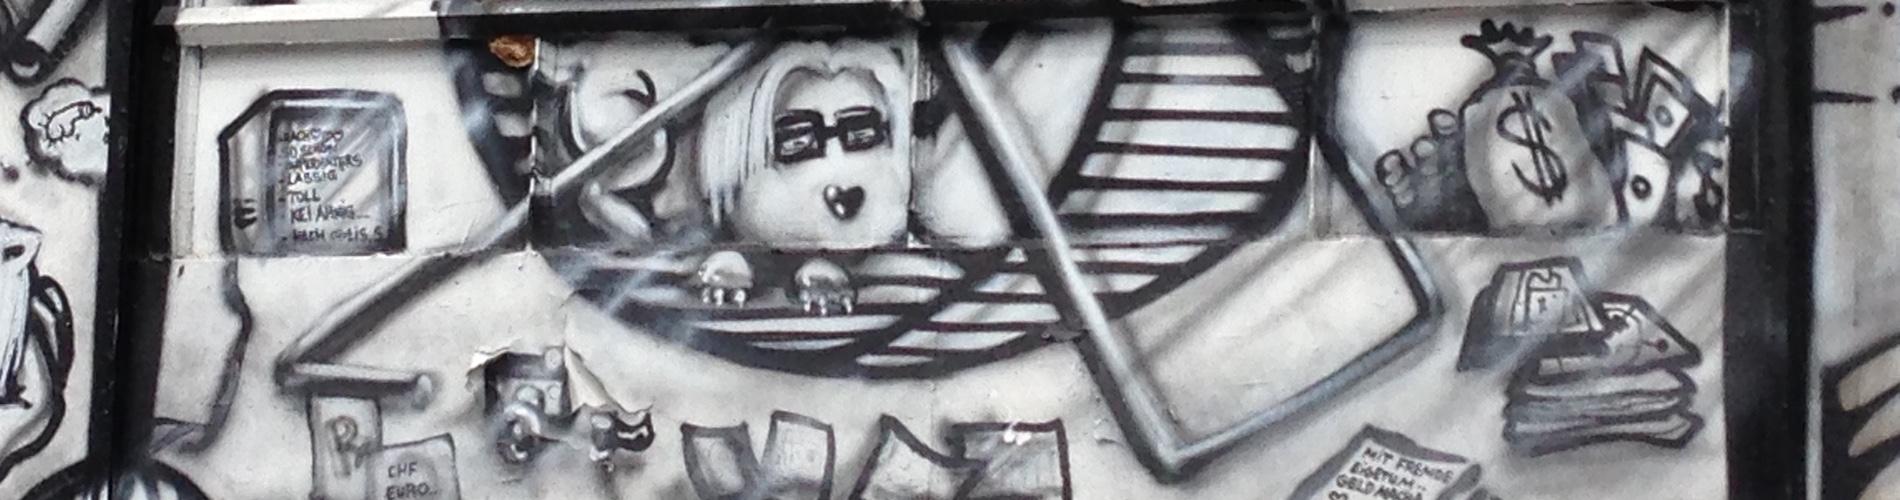 Top-30-BW-Grafitti-Wall-Zurich-Banner